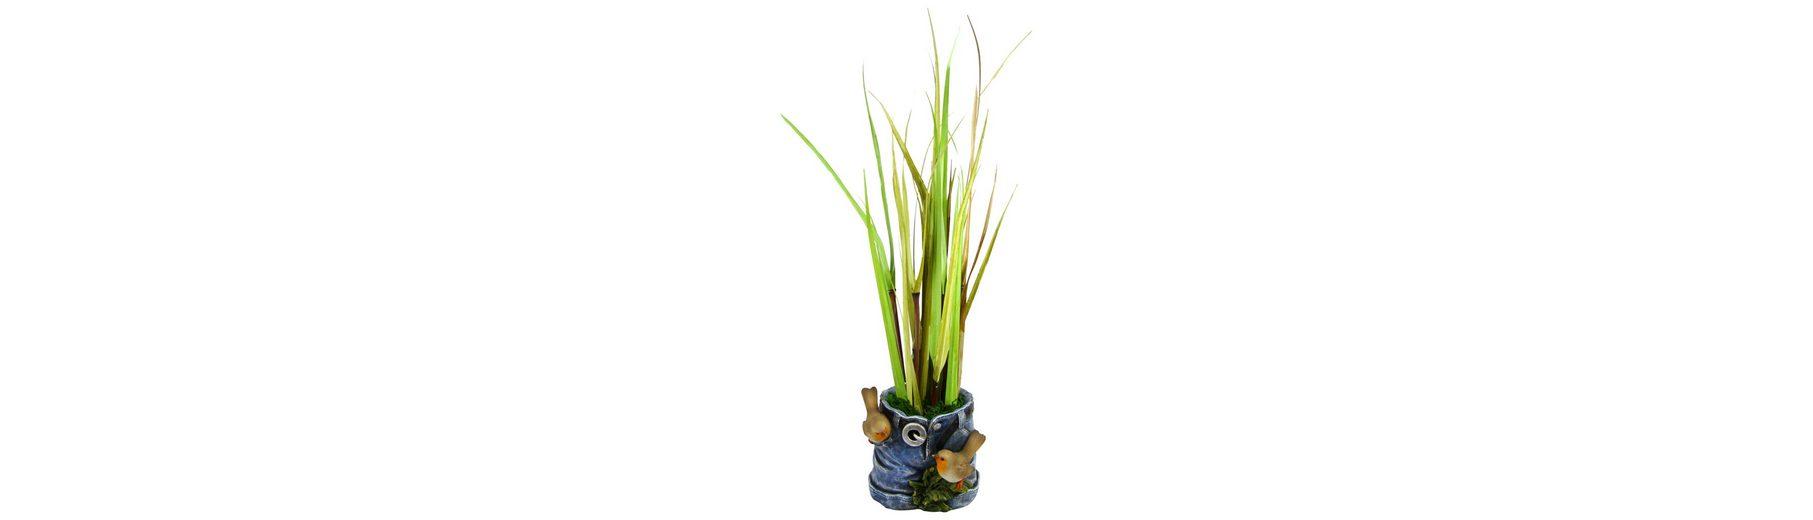 Home affaire Kunstblume »Gras in Hosen Übertopf«